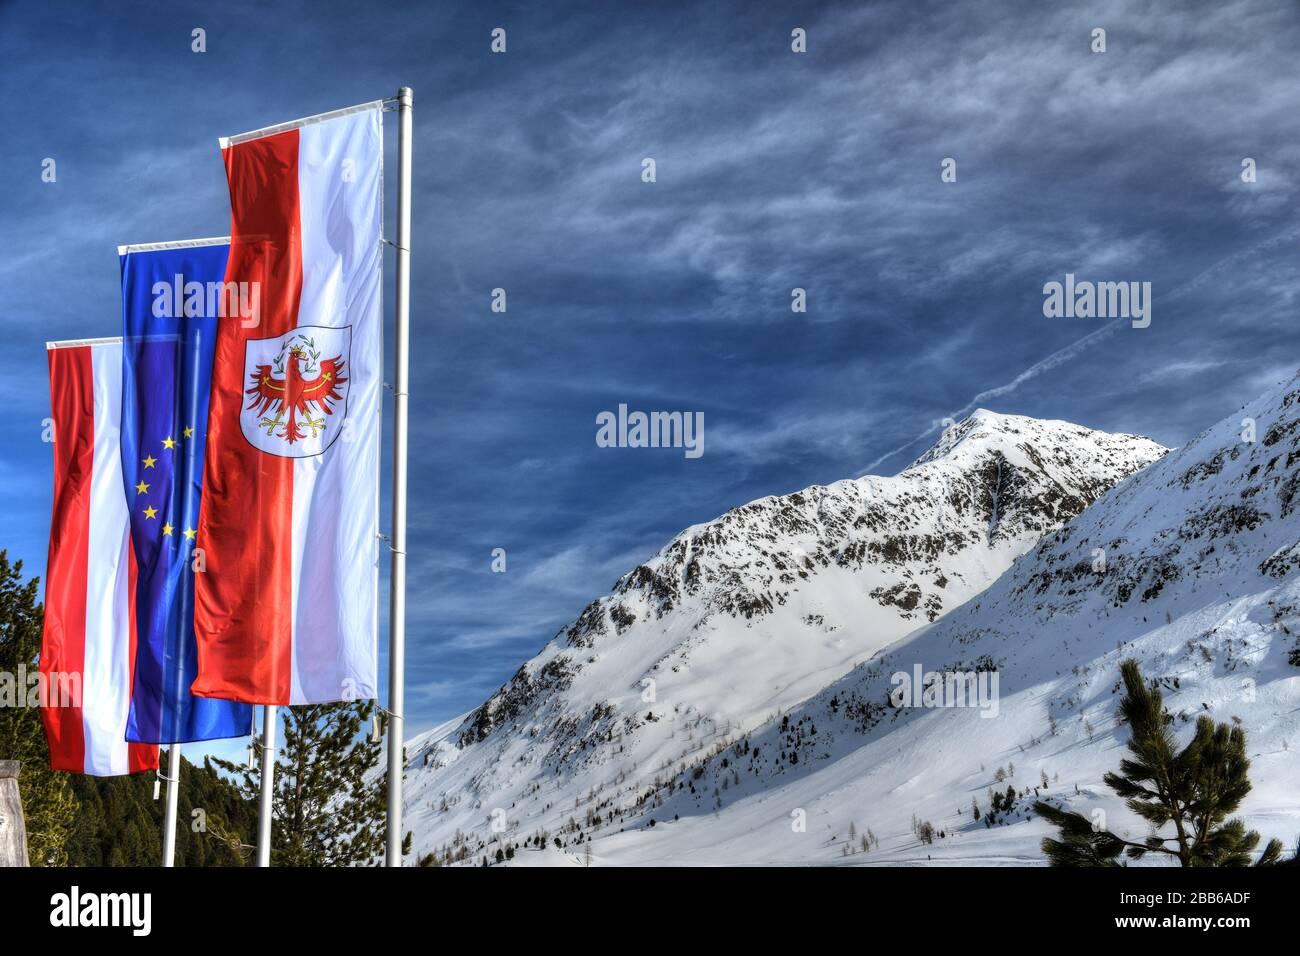 Staller Sattel, Stallersattel, Fahne, Flagge, Fahnenmast, Tirol, Österreich, EU, Himmel, wehen, Bundesland, Nation, Europa, Deferegger Alpen, Winter, Stock Photo